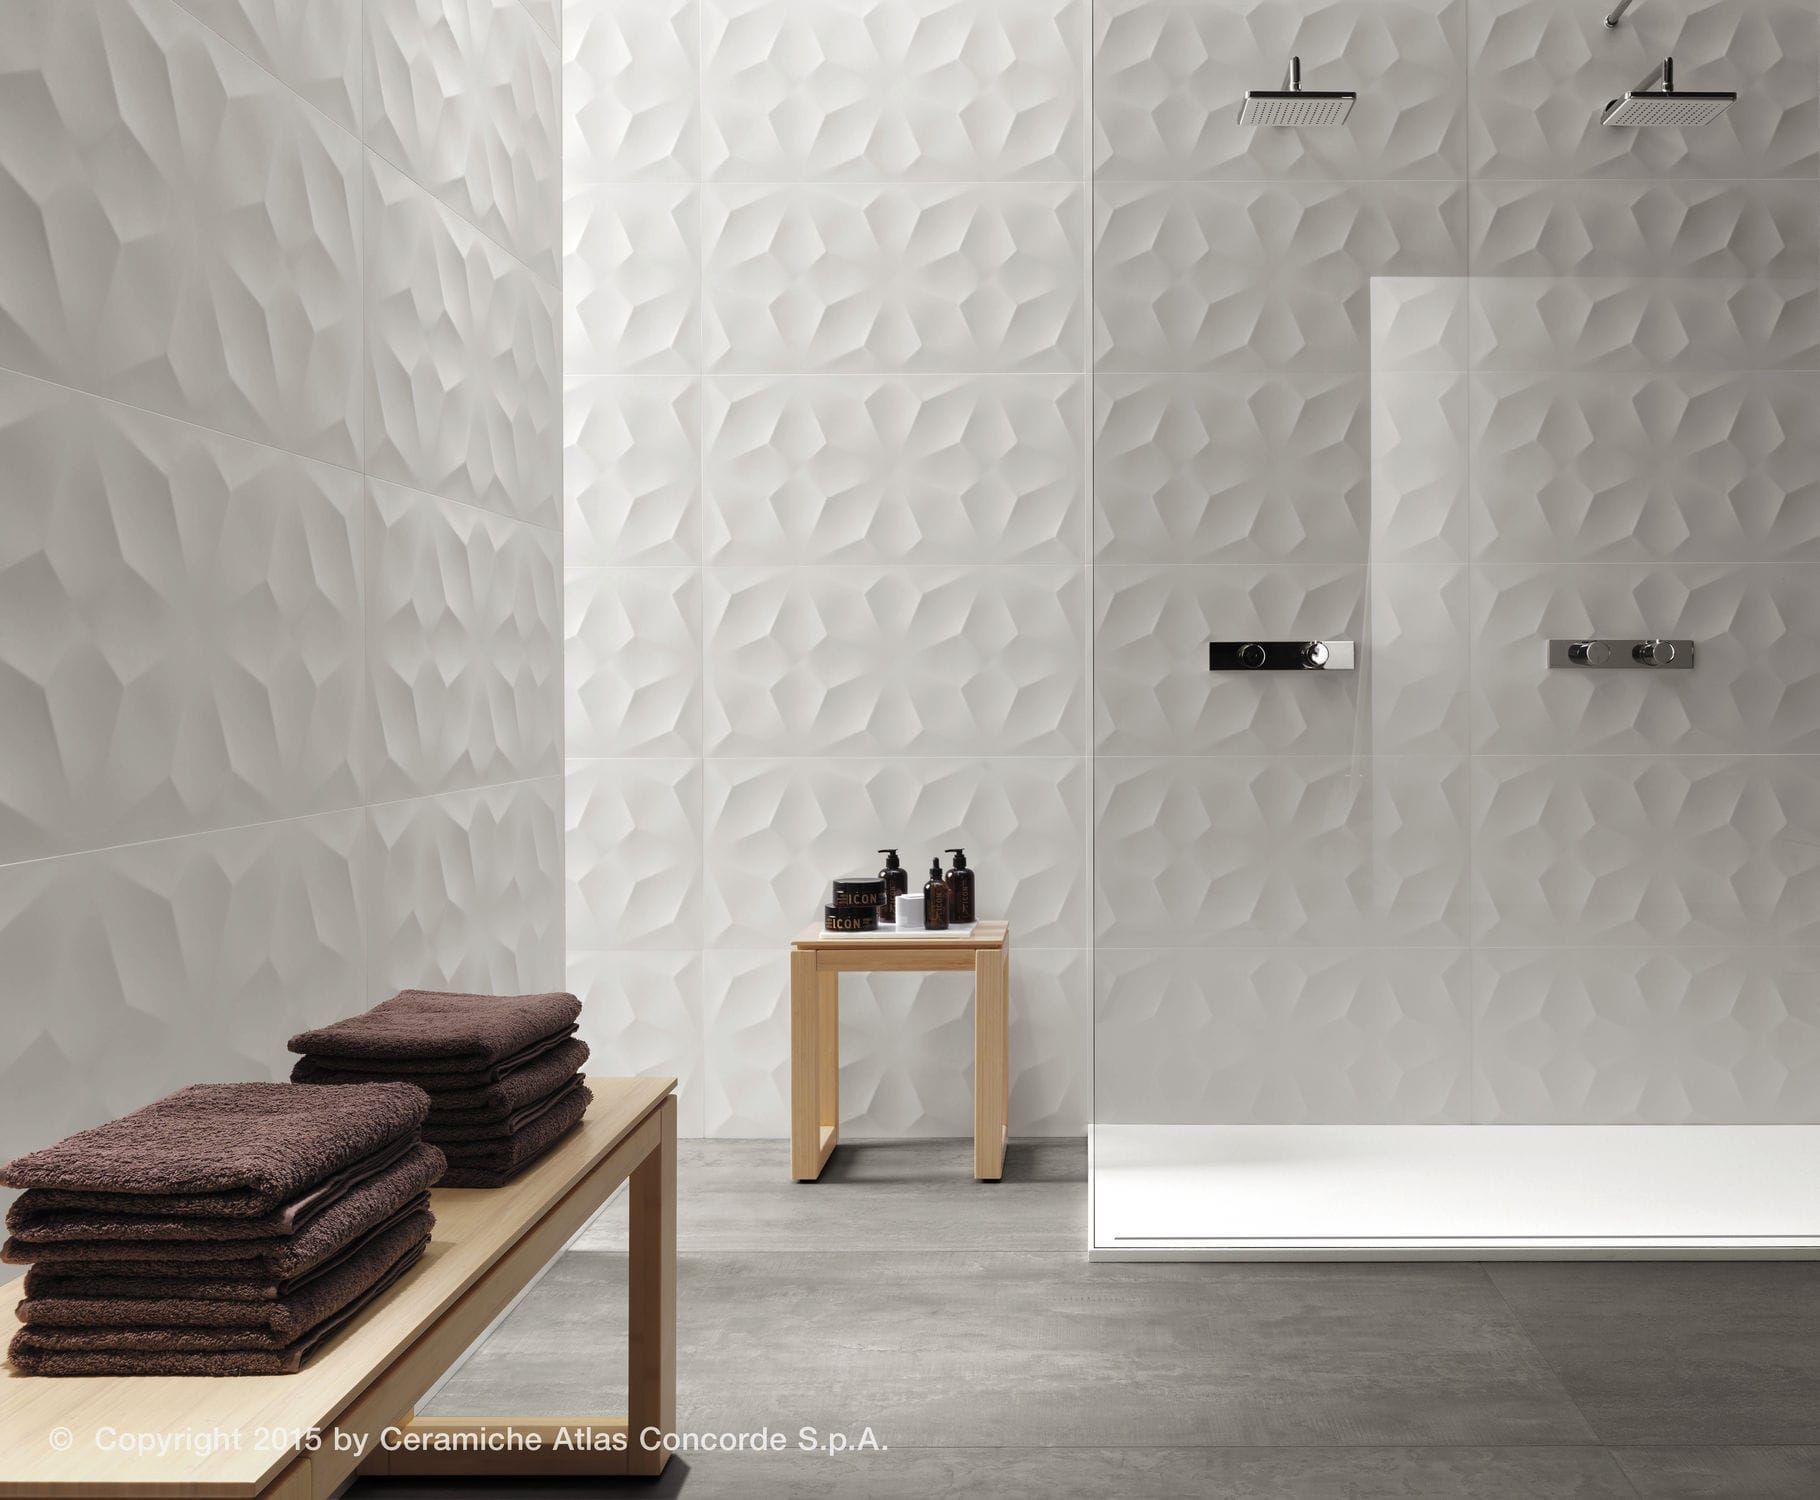 Indoor Tile Wall Ceramic 3d 3dwalldesign Blade Atlas Concorde Videos Living Room Tiles 3d Wall Tiles Wall Cladding